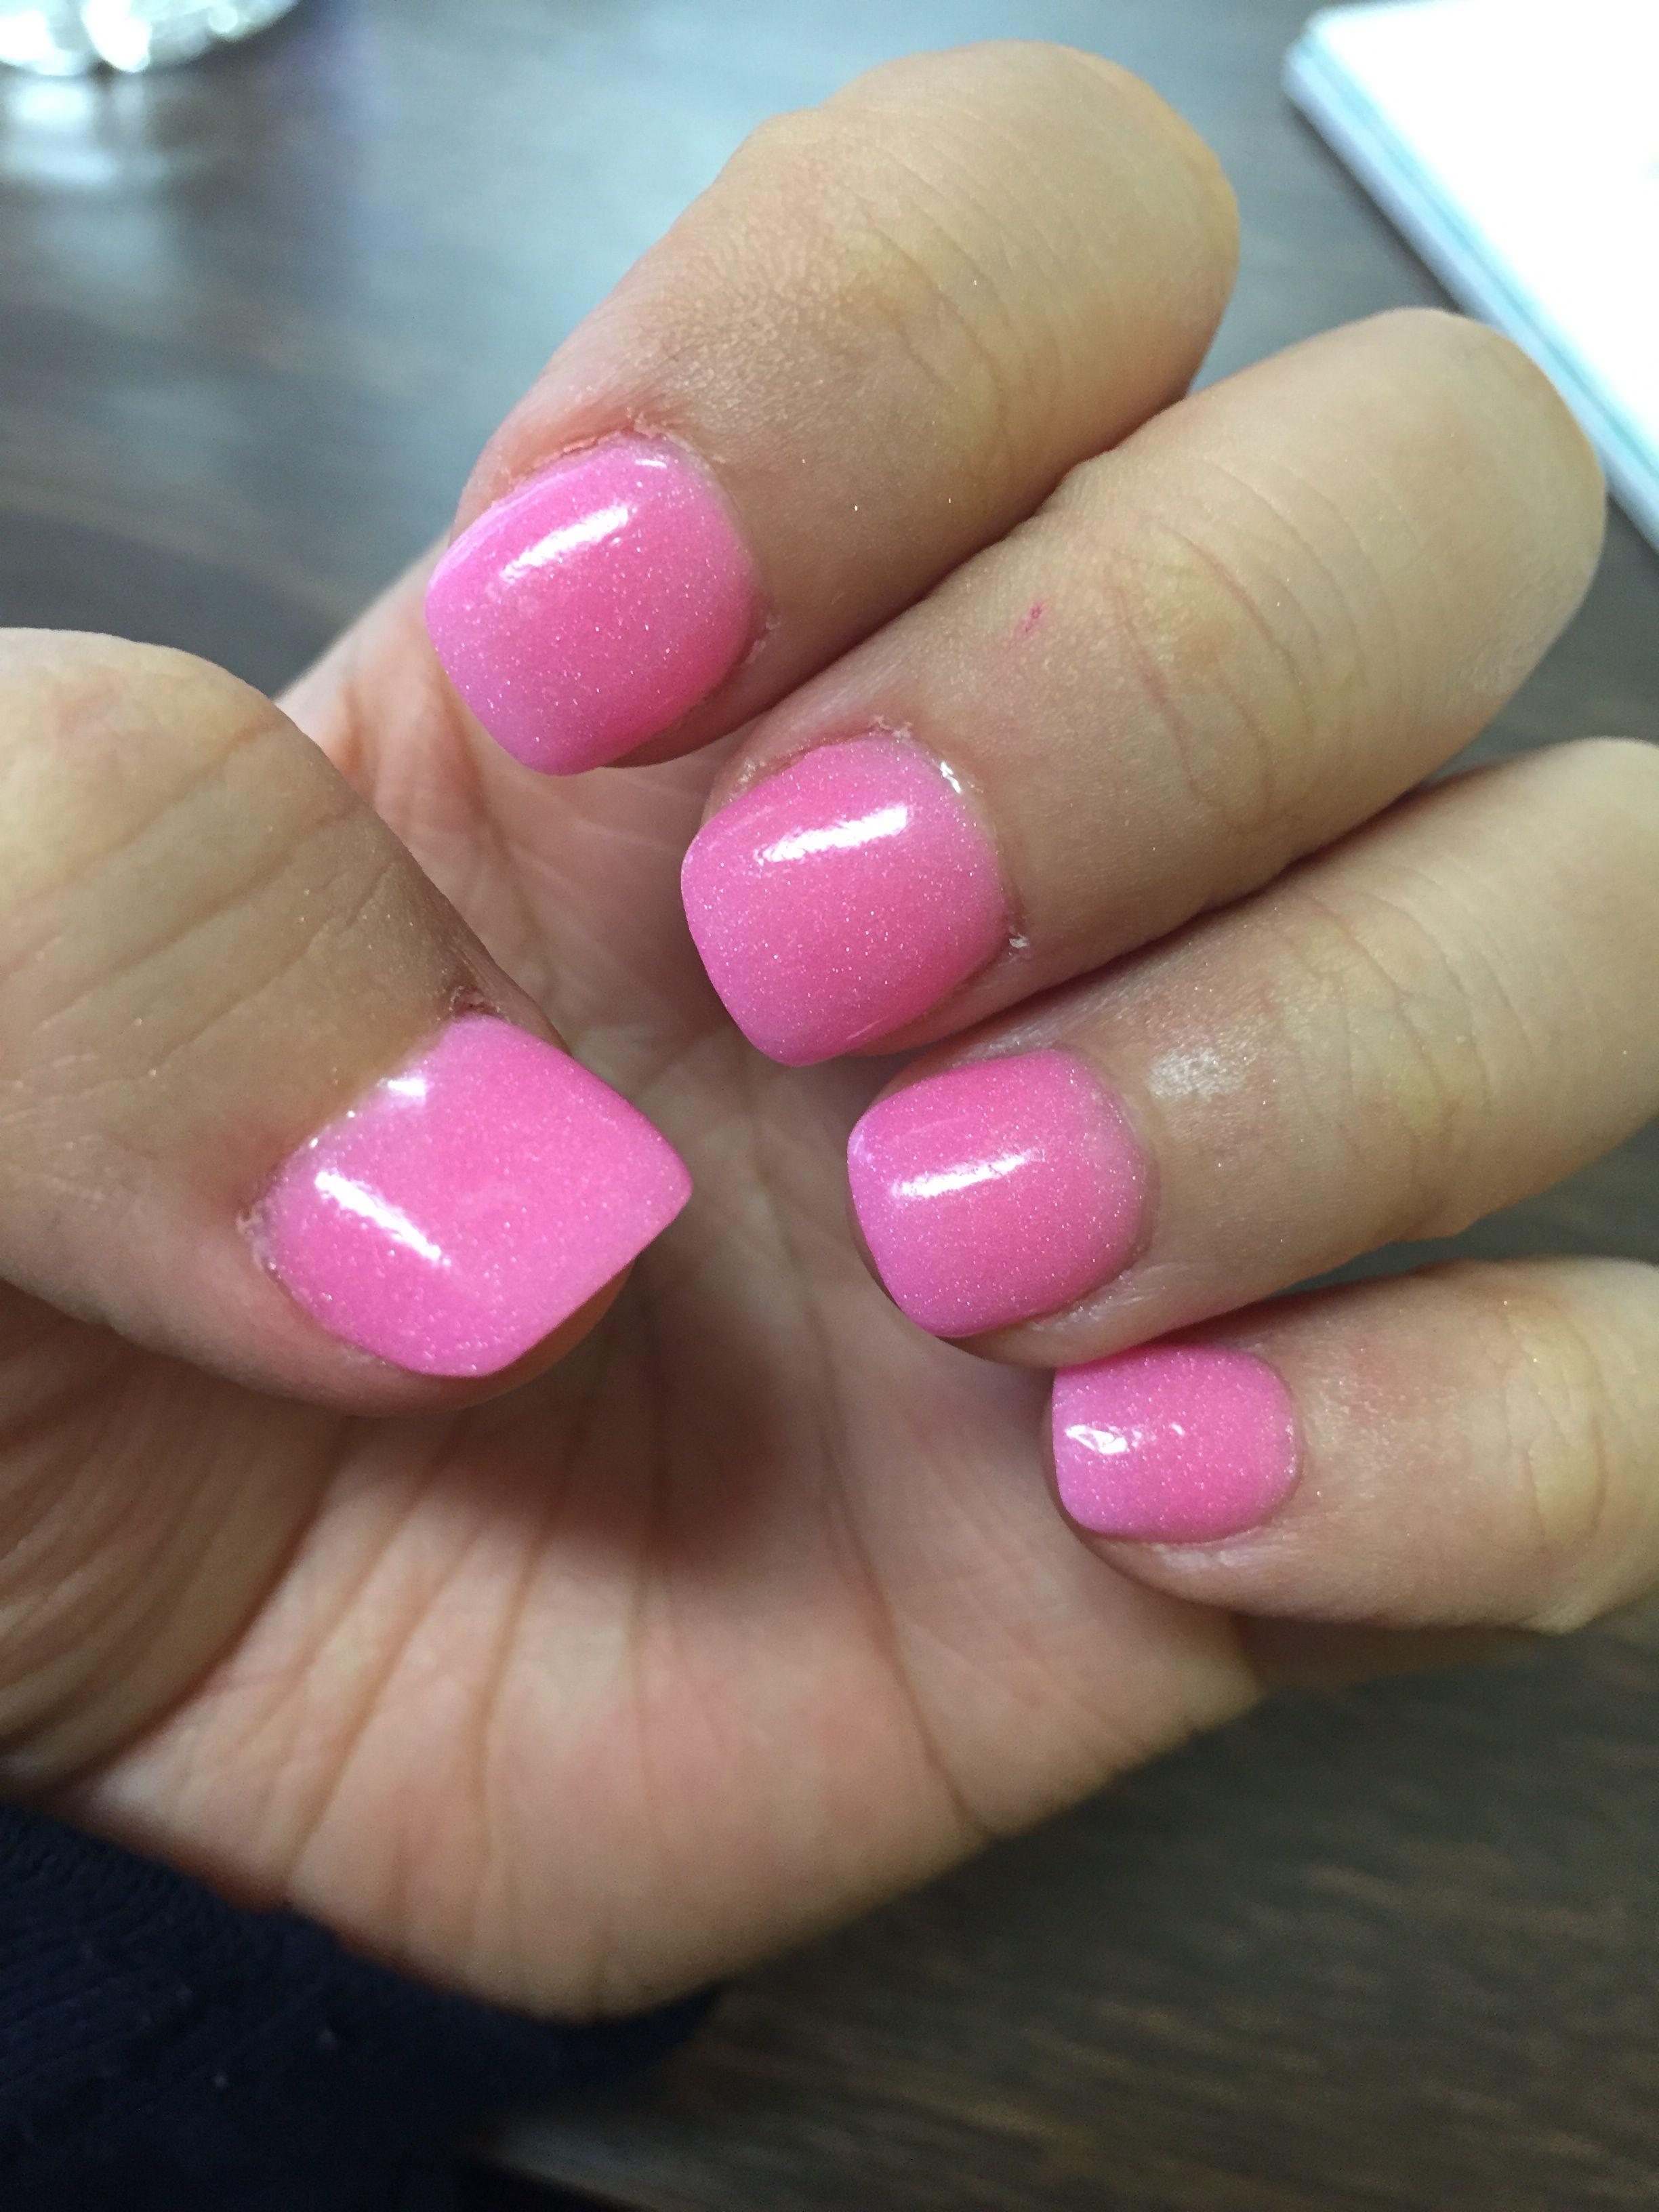 Nexgen nails (C10-Hollywood) | Nails | Pinterest | Makeup